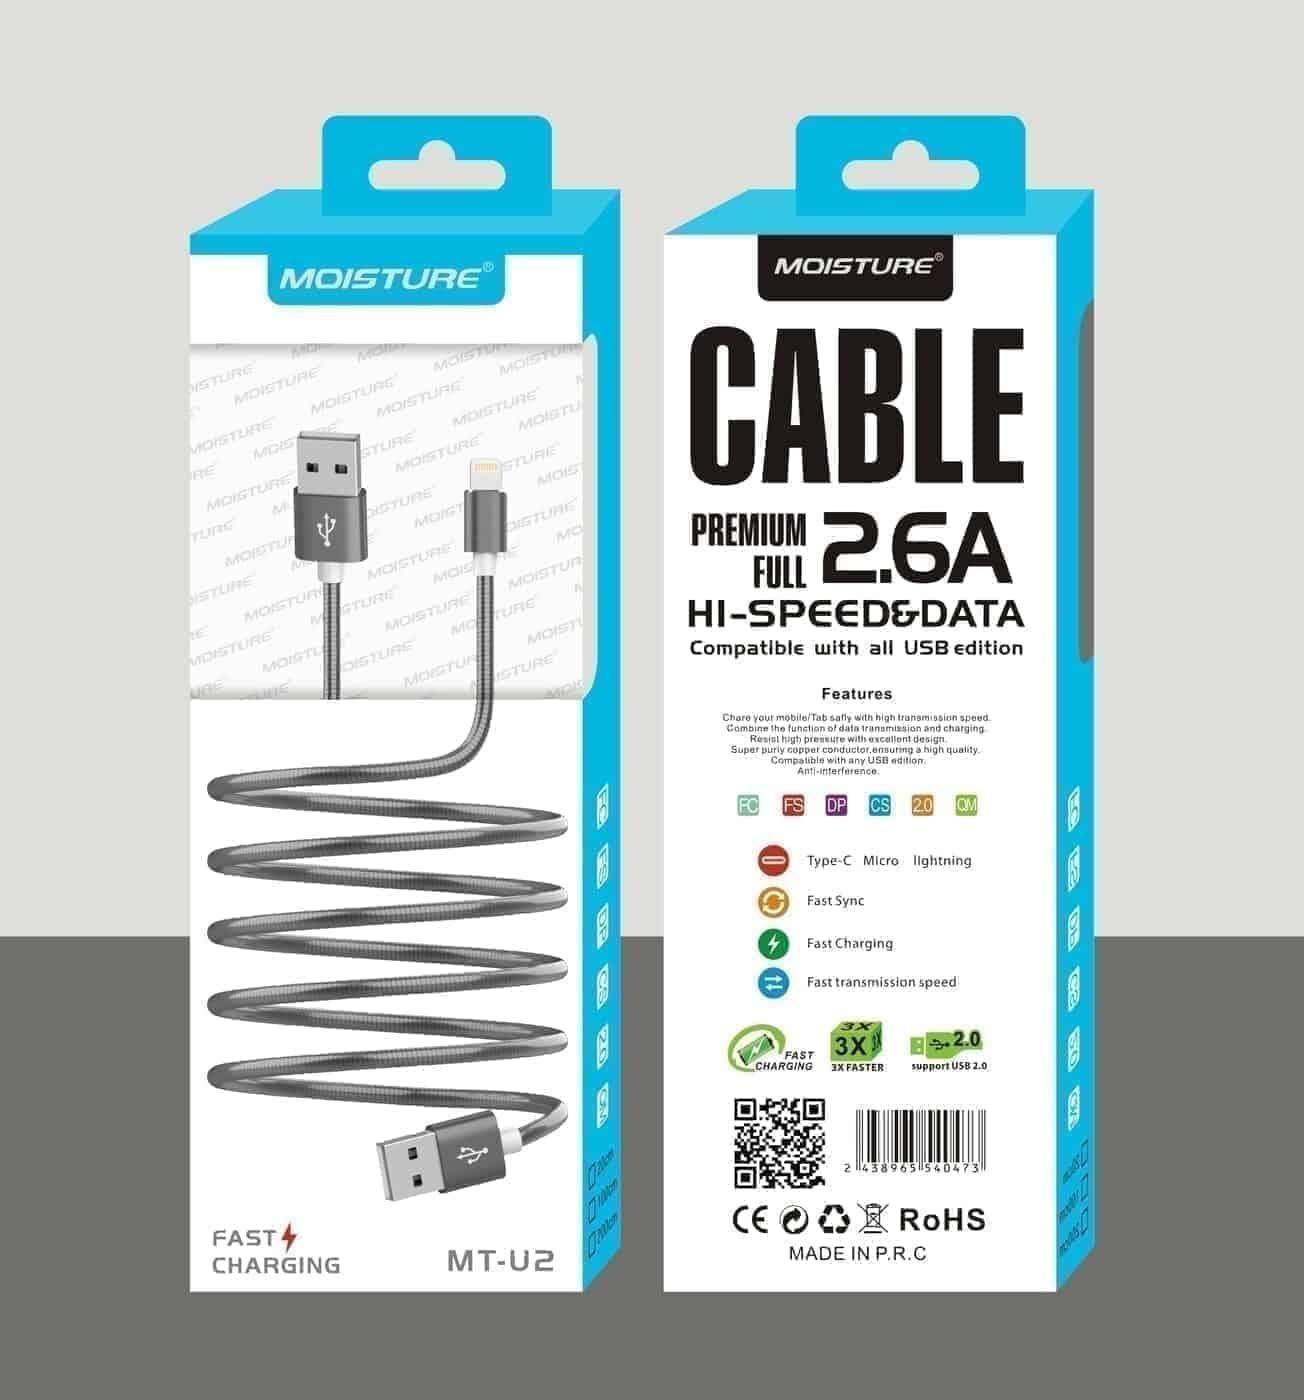 Moisture 2.6A Premium Full Hi-Speed Data Cable In Gray